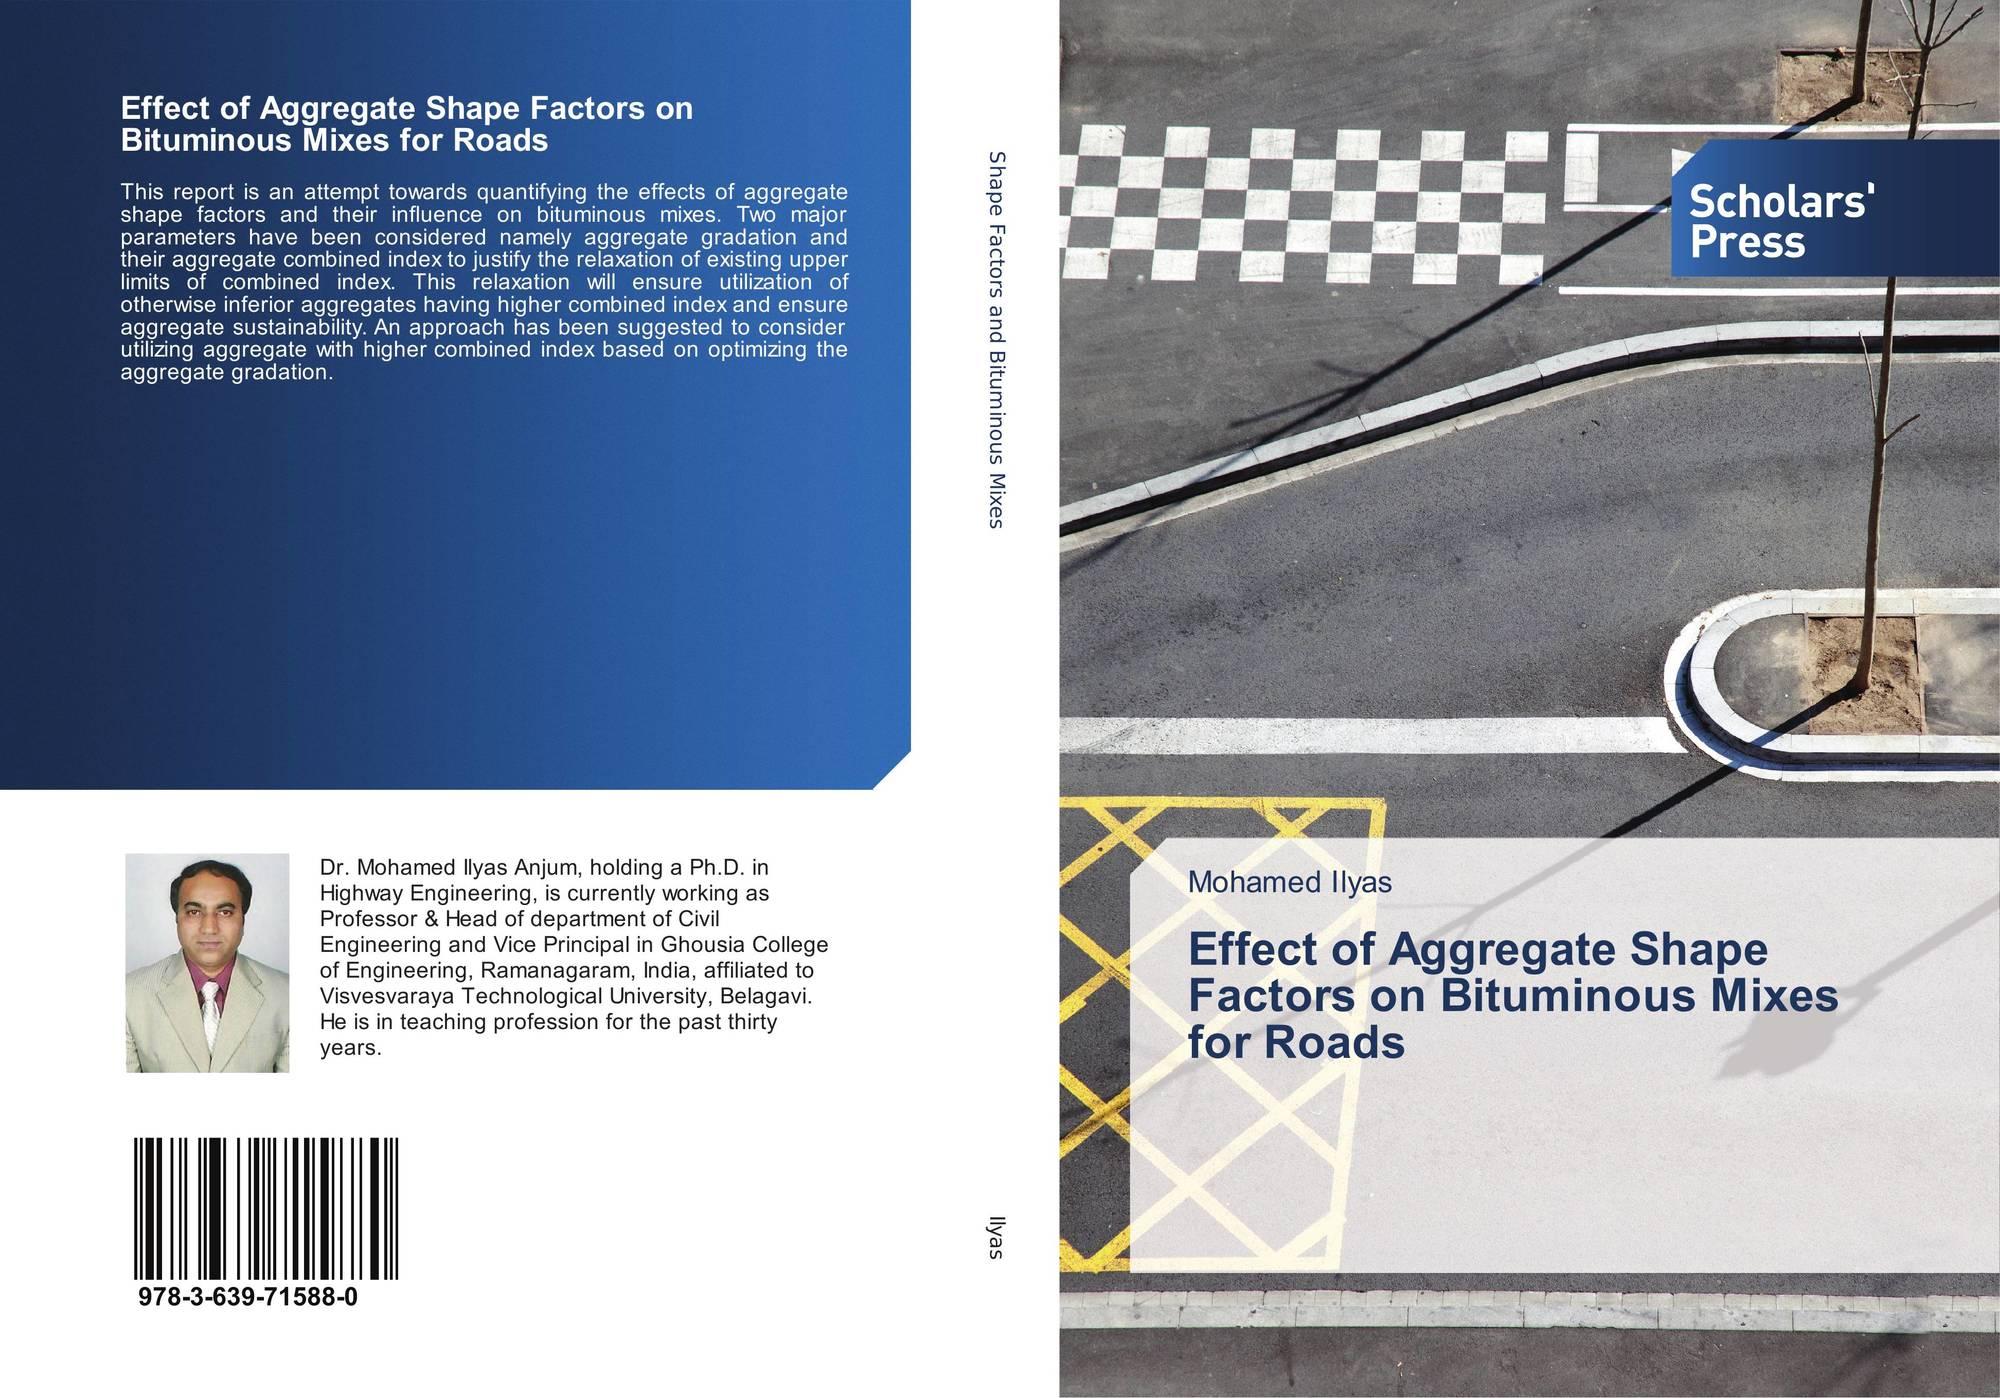 Effect of Aggregate Shape Factors on Bituminous Mixes for